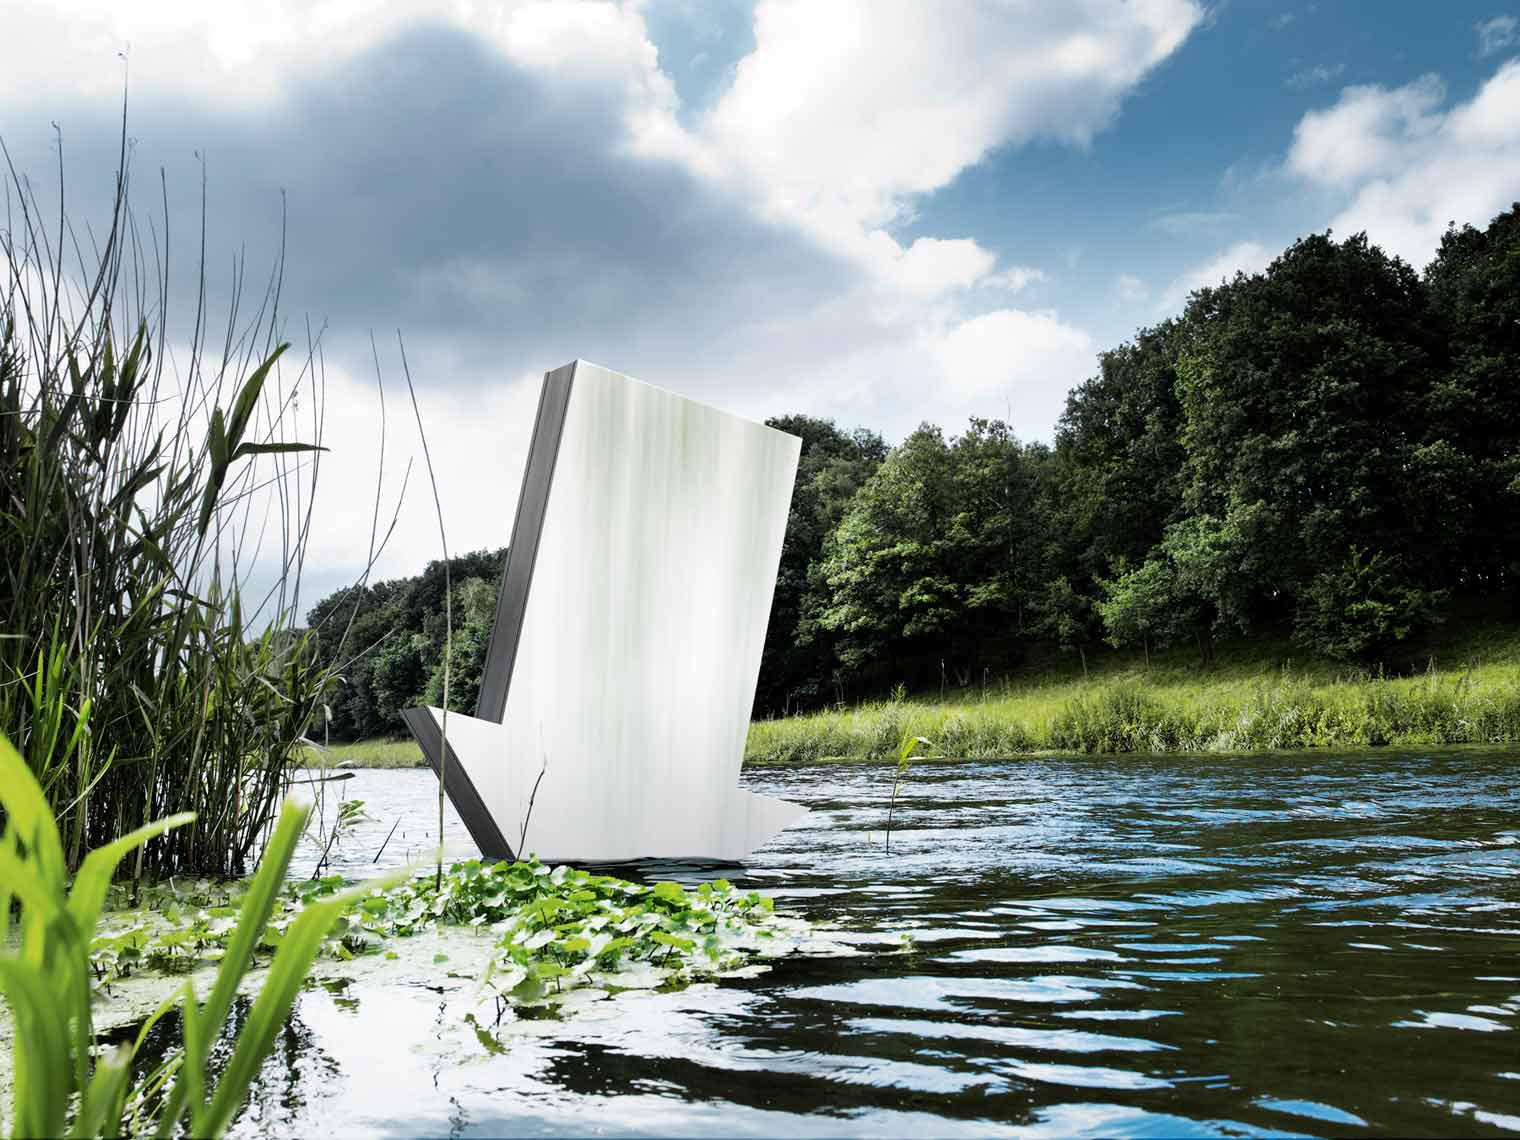 reclamefotografie-rotterdam-maas-en-aa--fotograaf-pim-vuik-02.jpg